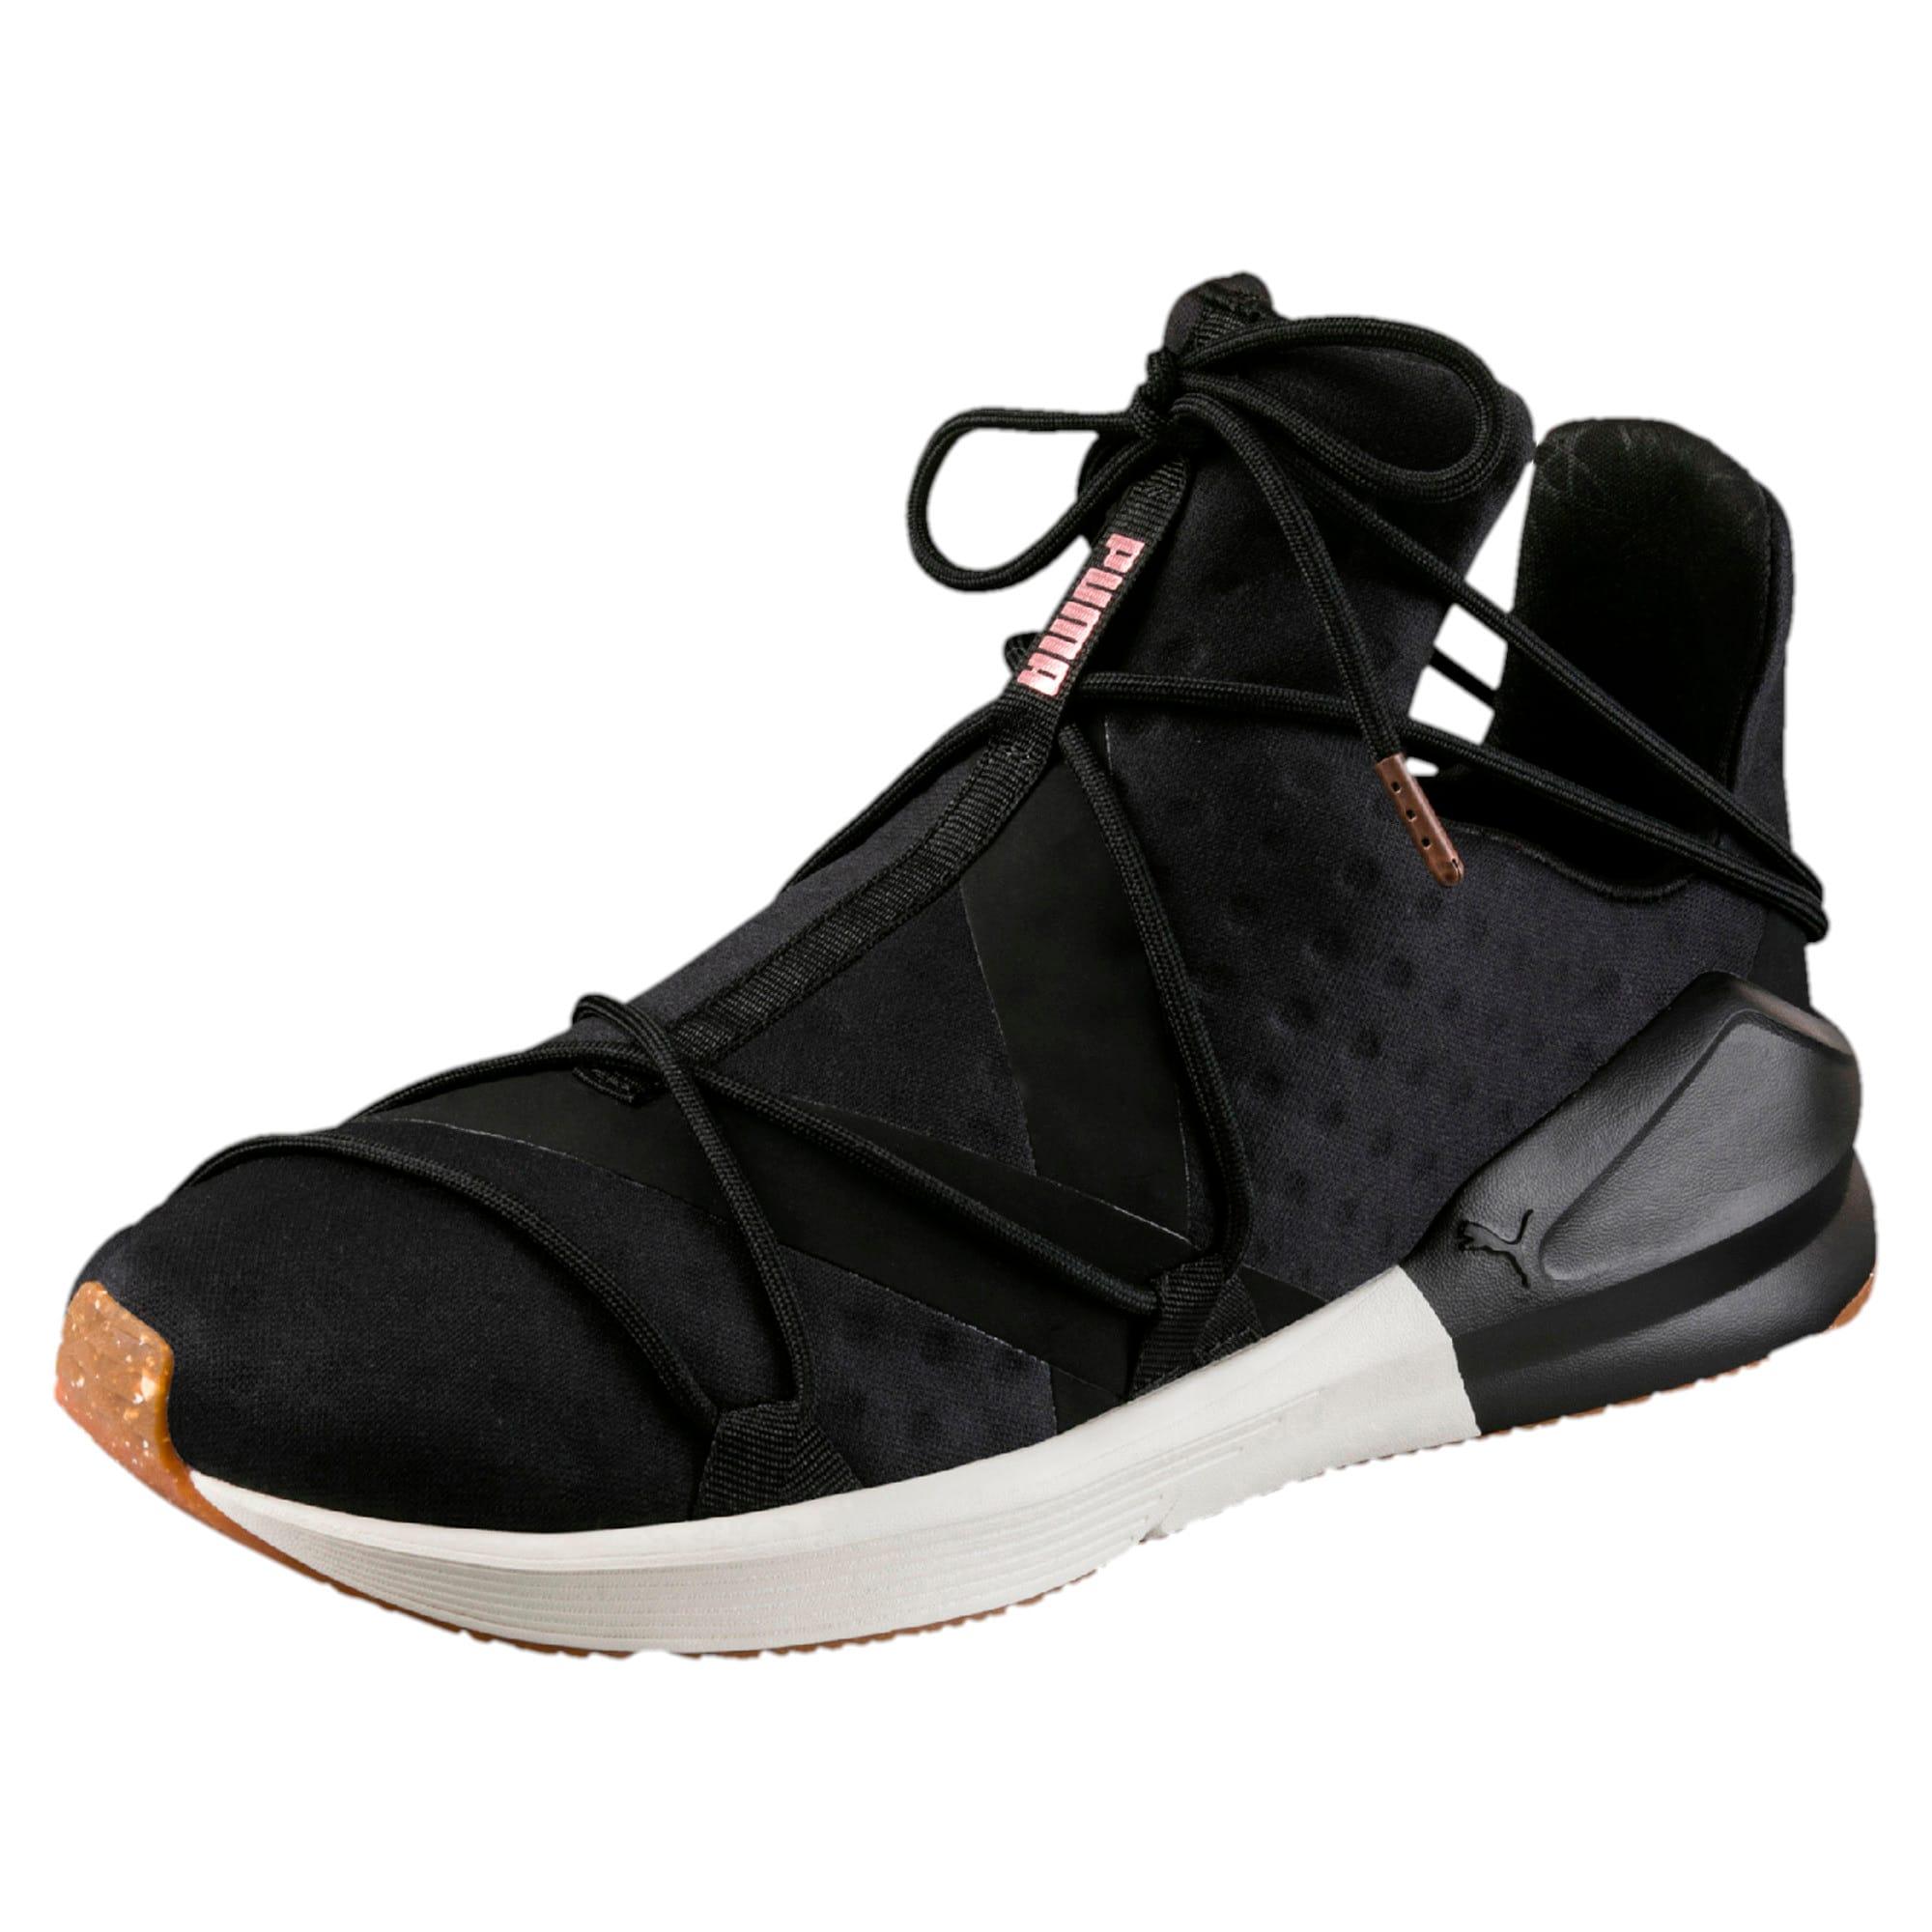 Thumbnail 1 of Fierce Rope VR Women's Training Shoes, Puma Black-Whisper White, medium-IND